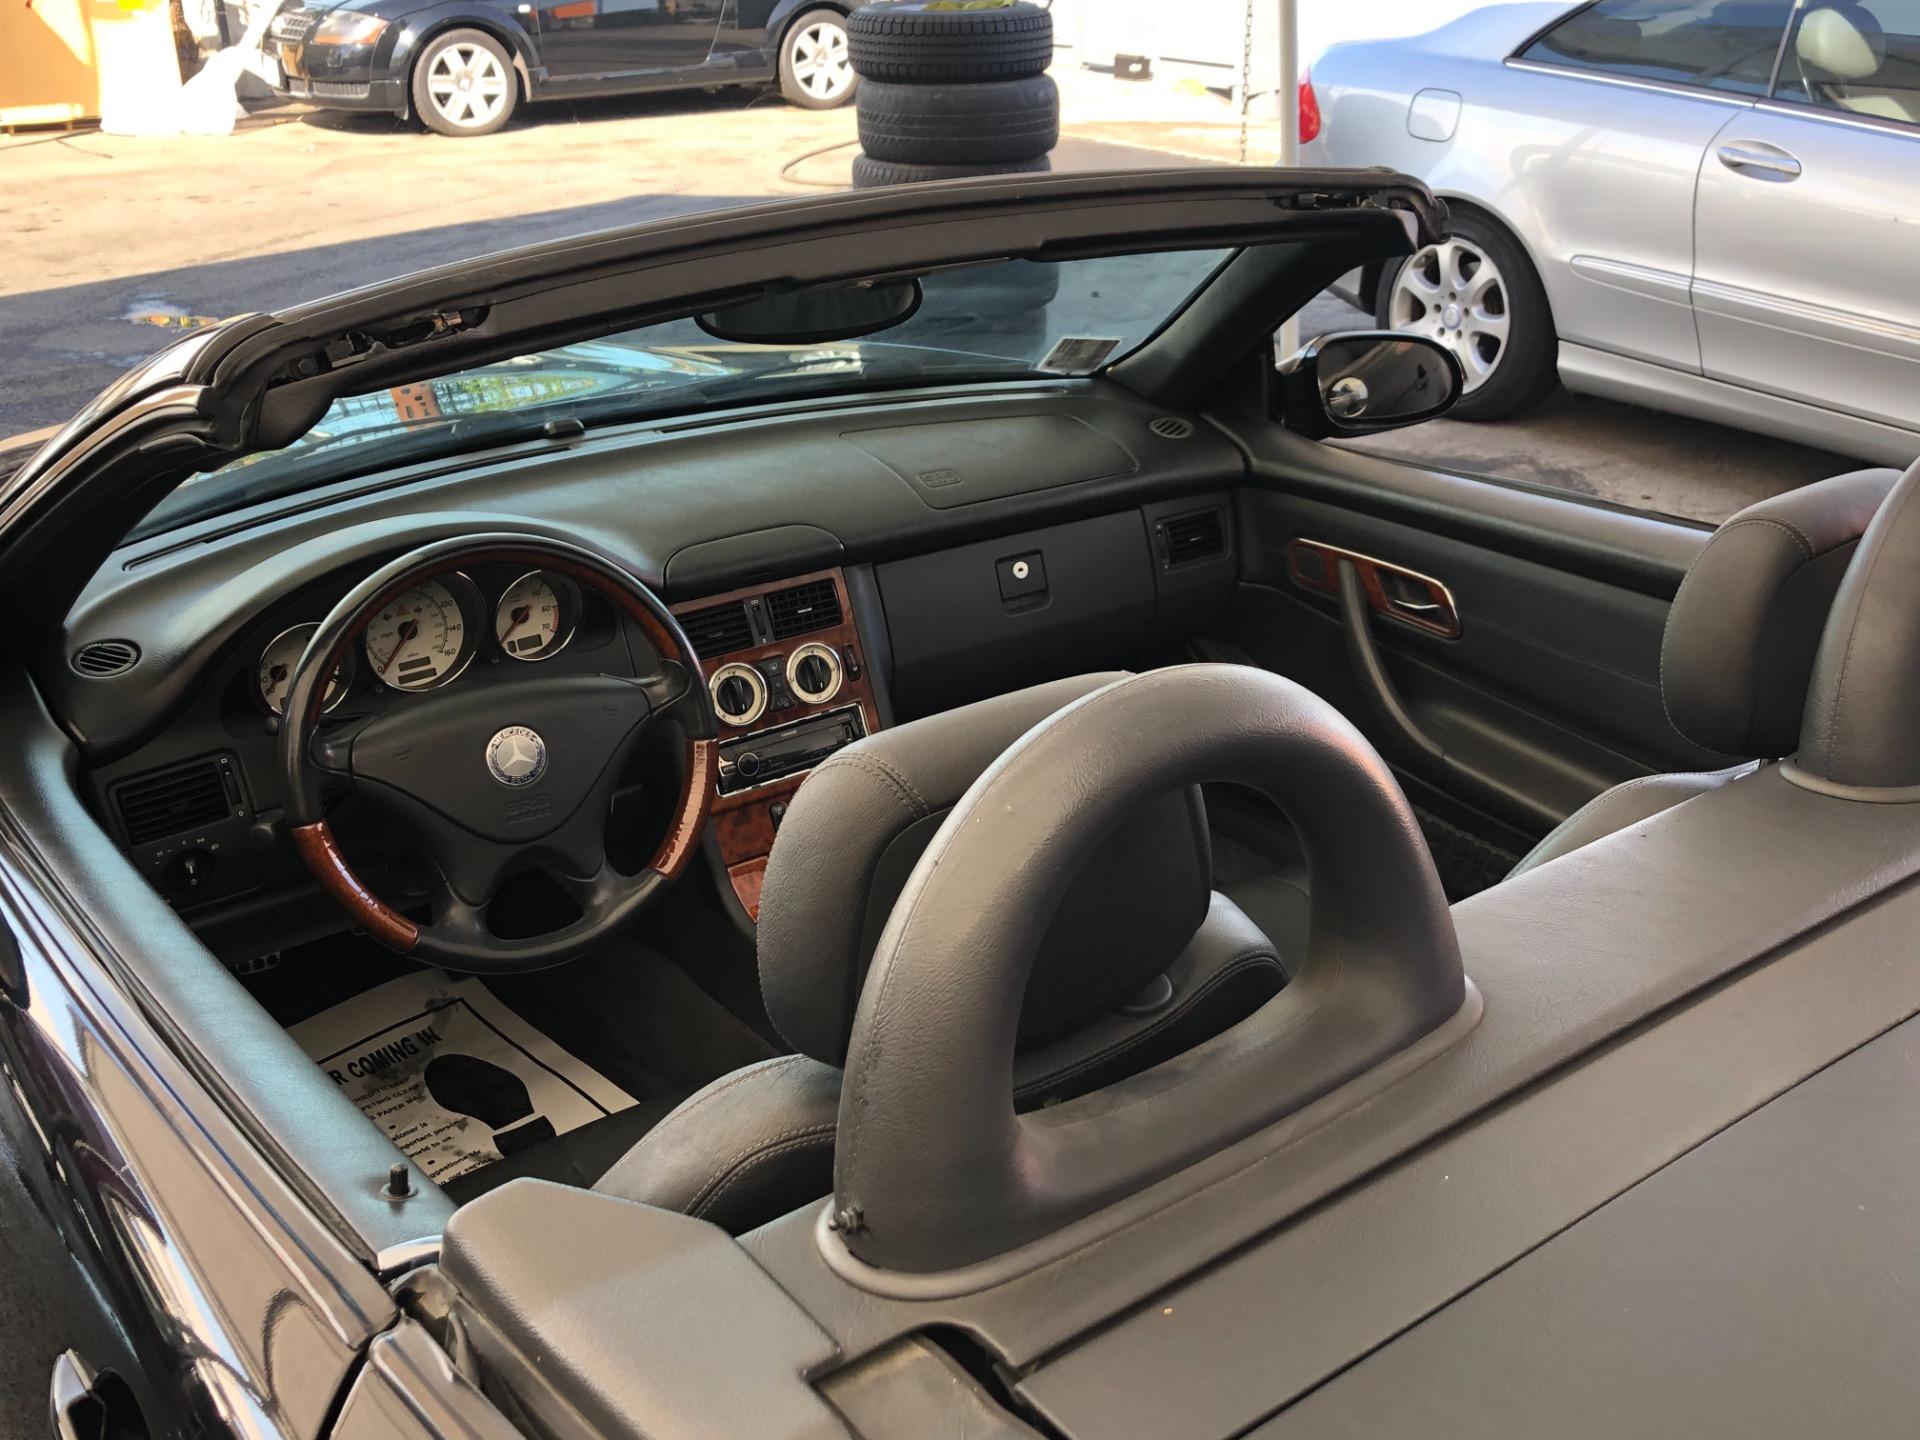 Used 2001 Mercedes Benz SLK Class 320 SLK